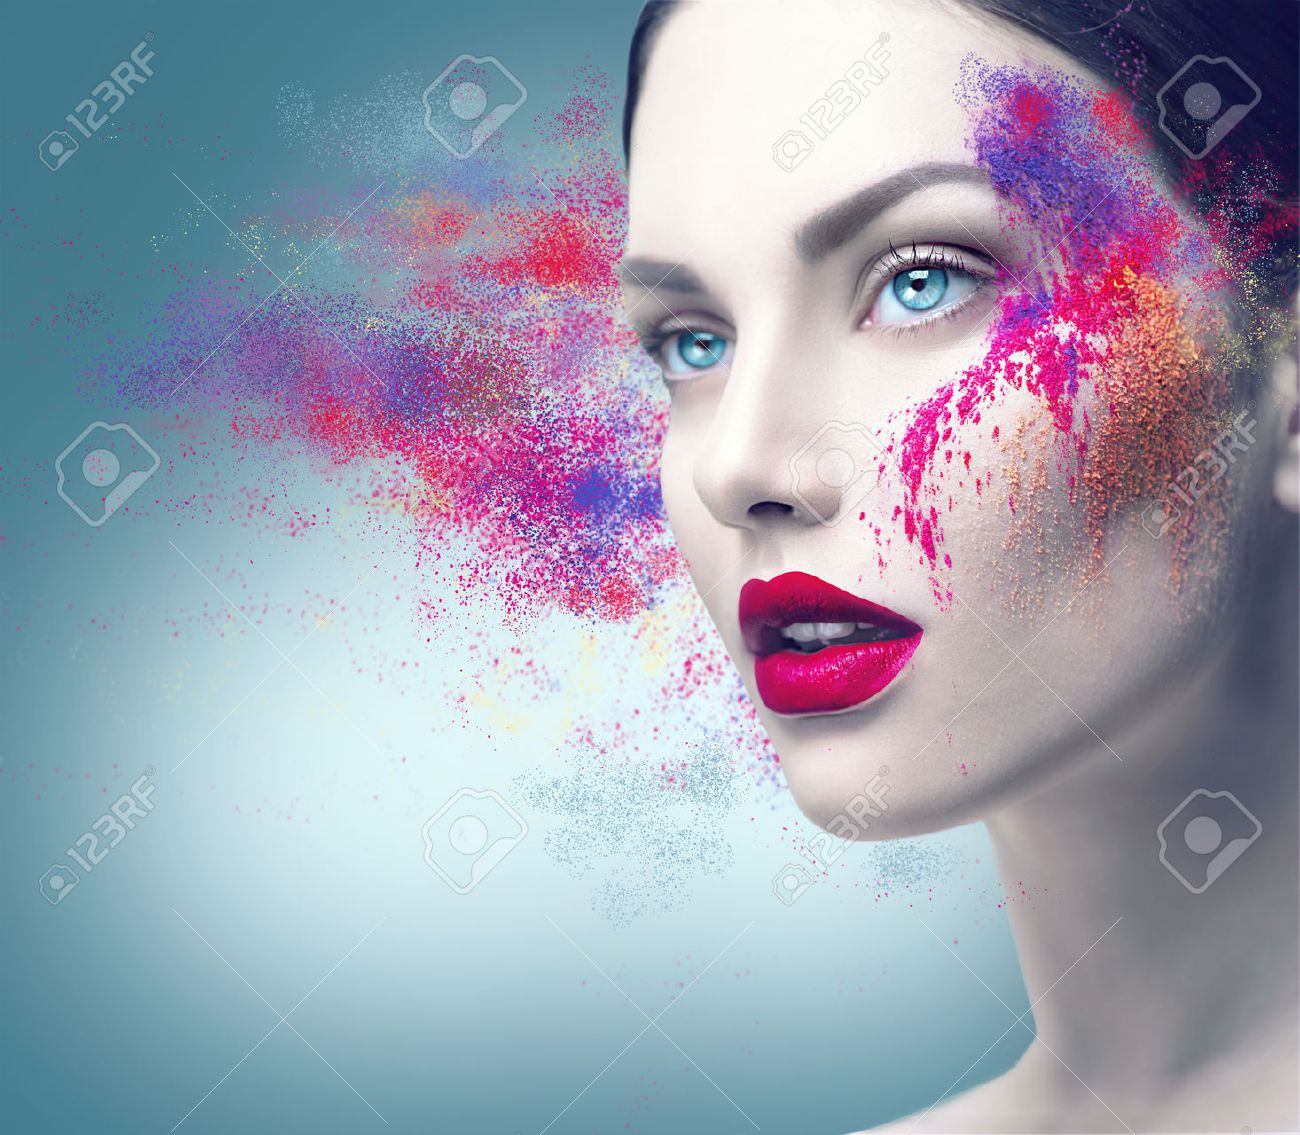 Fashion model girl portrait with colorful powder makeup Banque d'images - 63997788